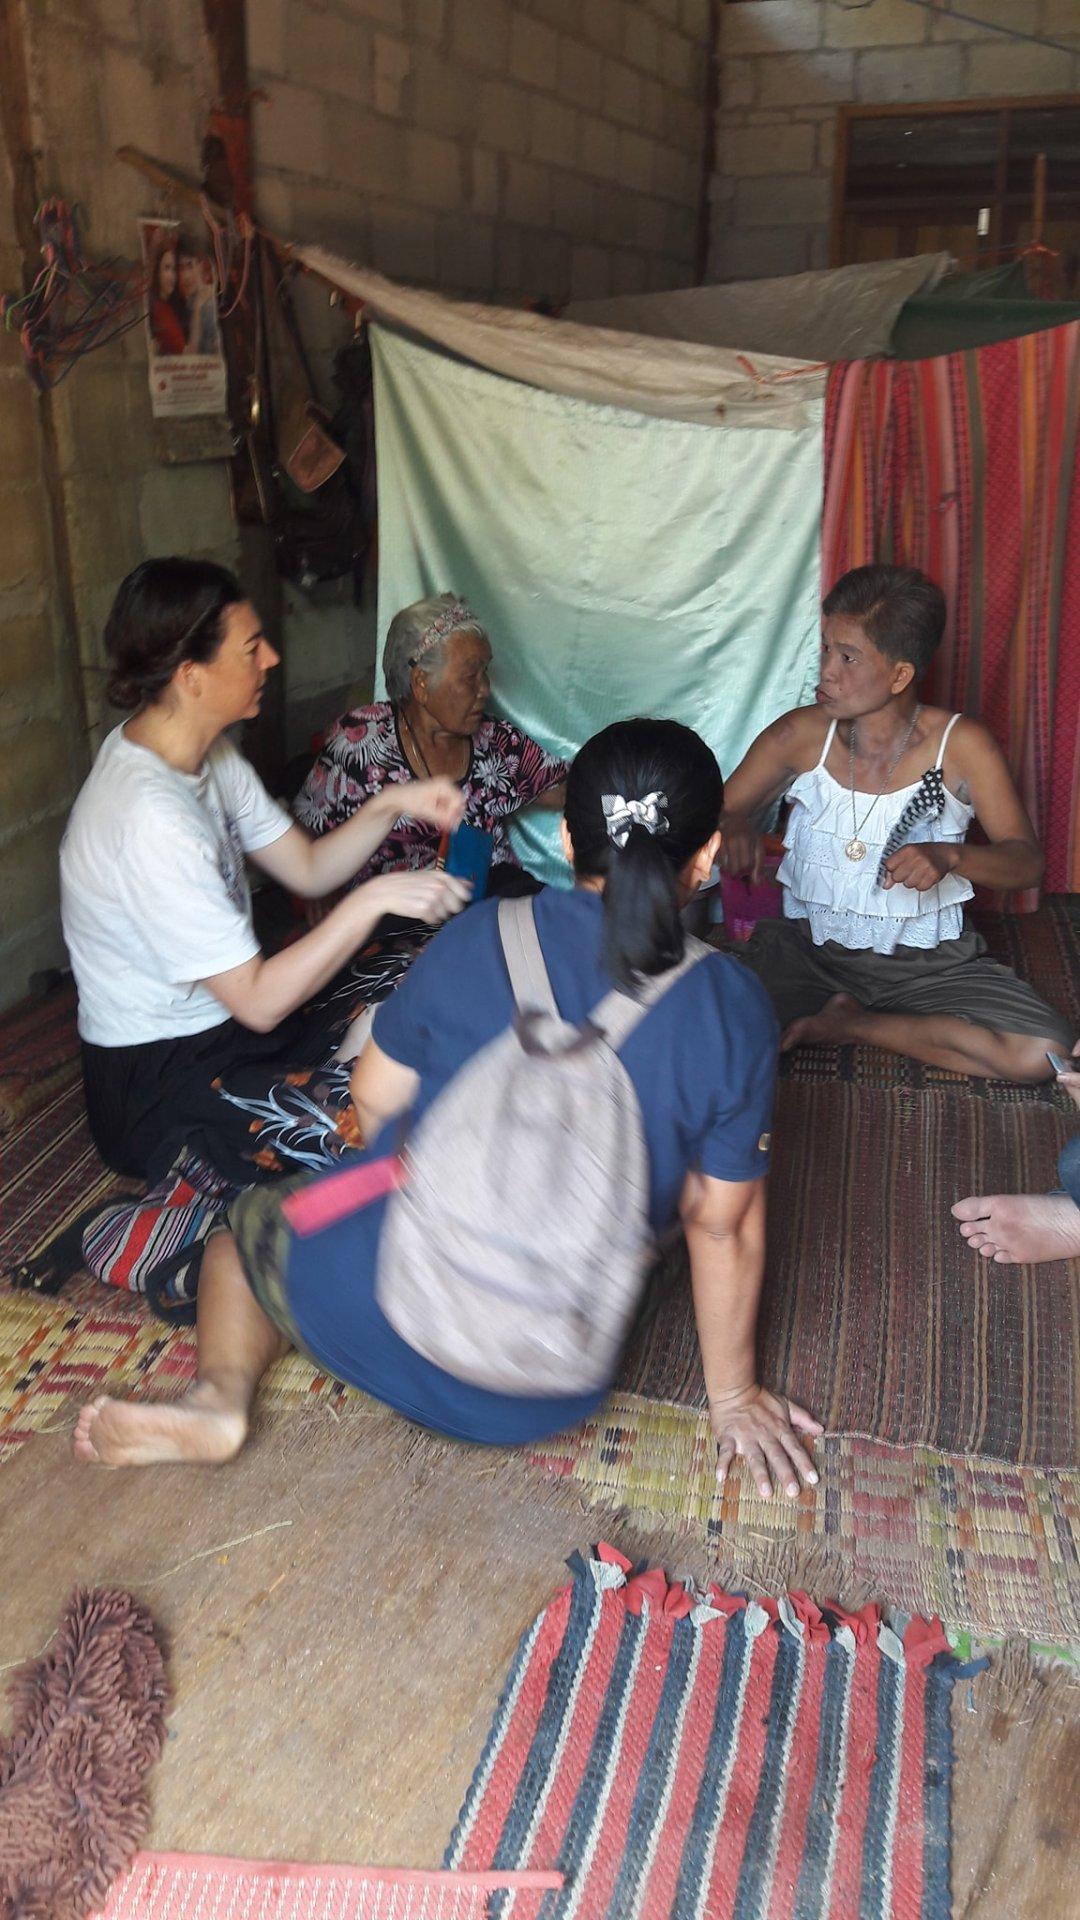 Mundo and Lokgatat interviewing elder and her daughter